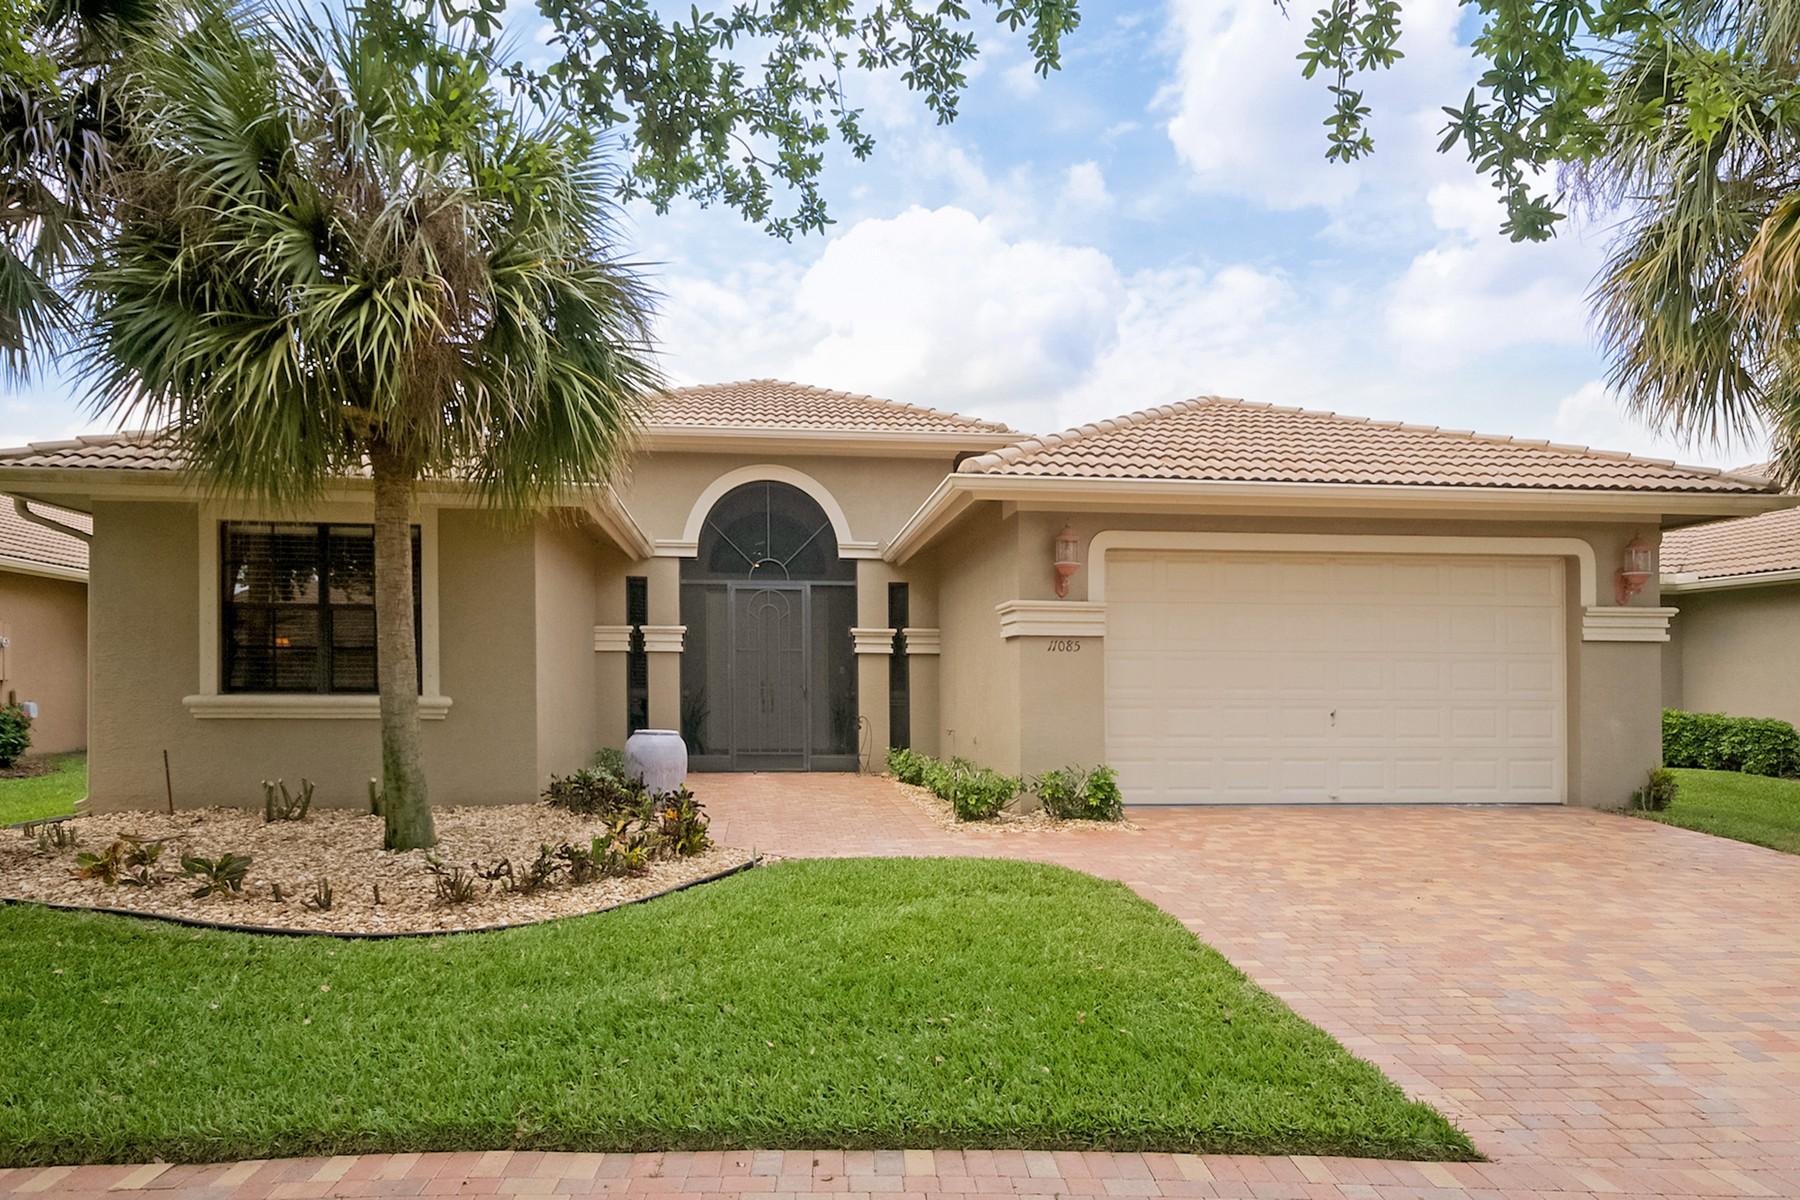 Property For Sale at 11085 Via Amalfi , Boynton Beach, FL 33437